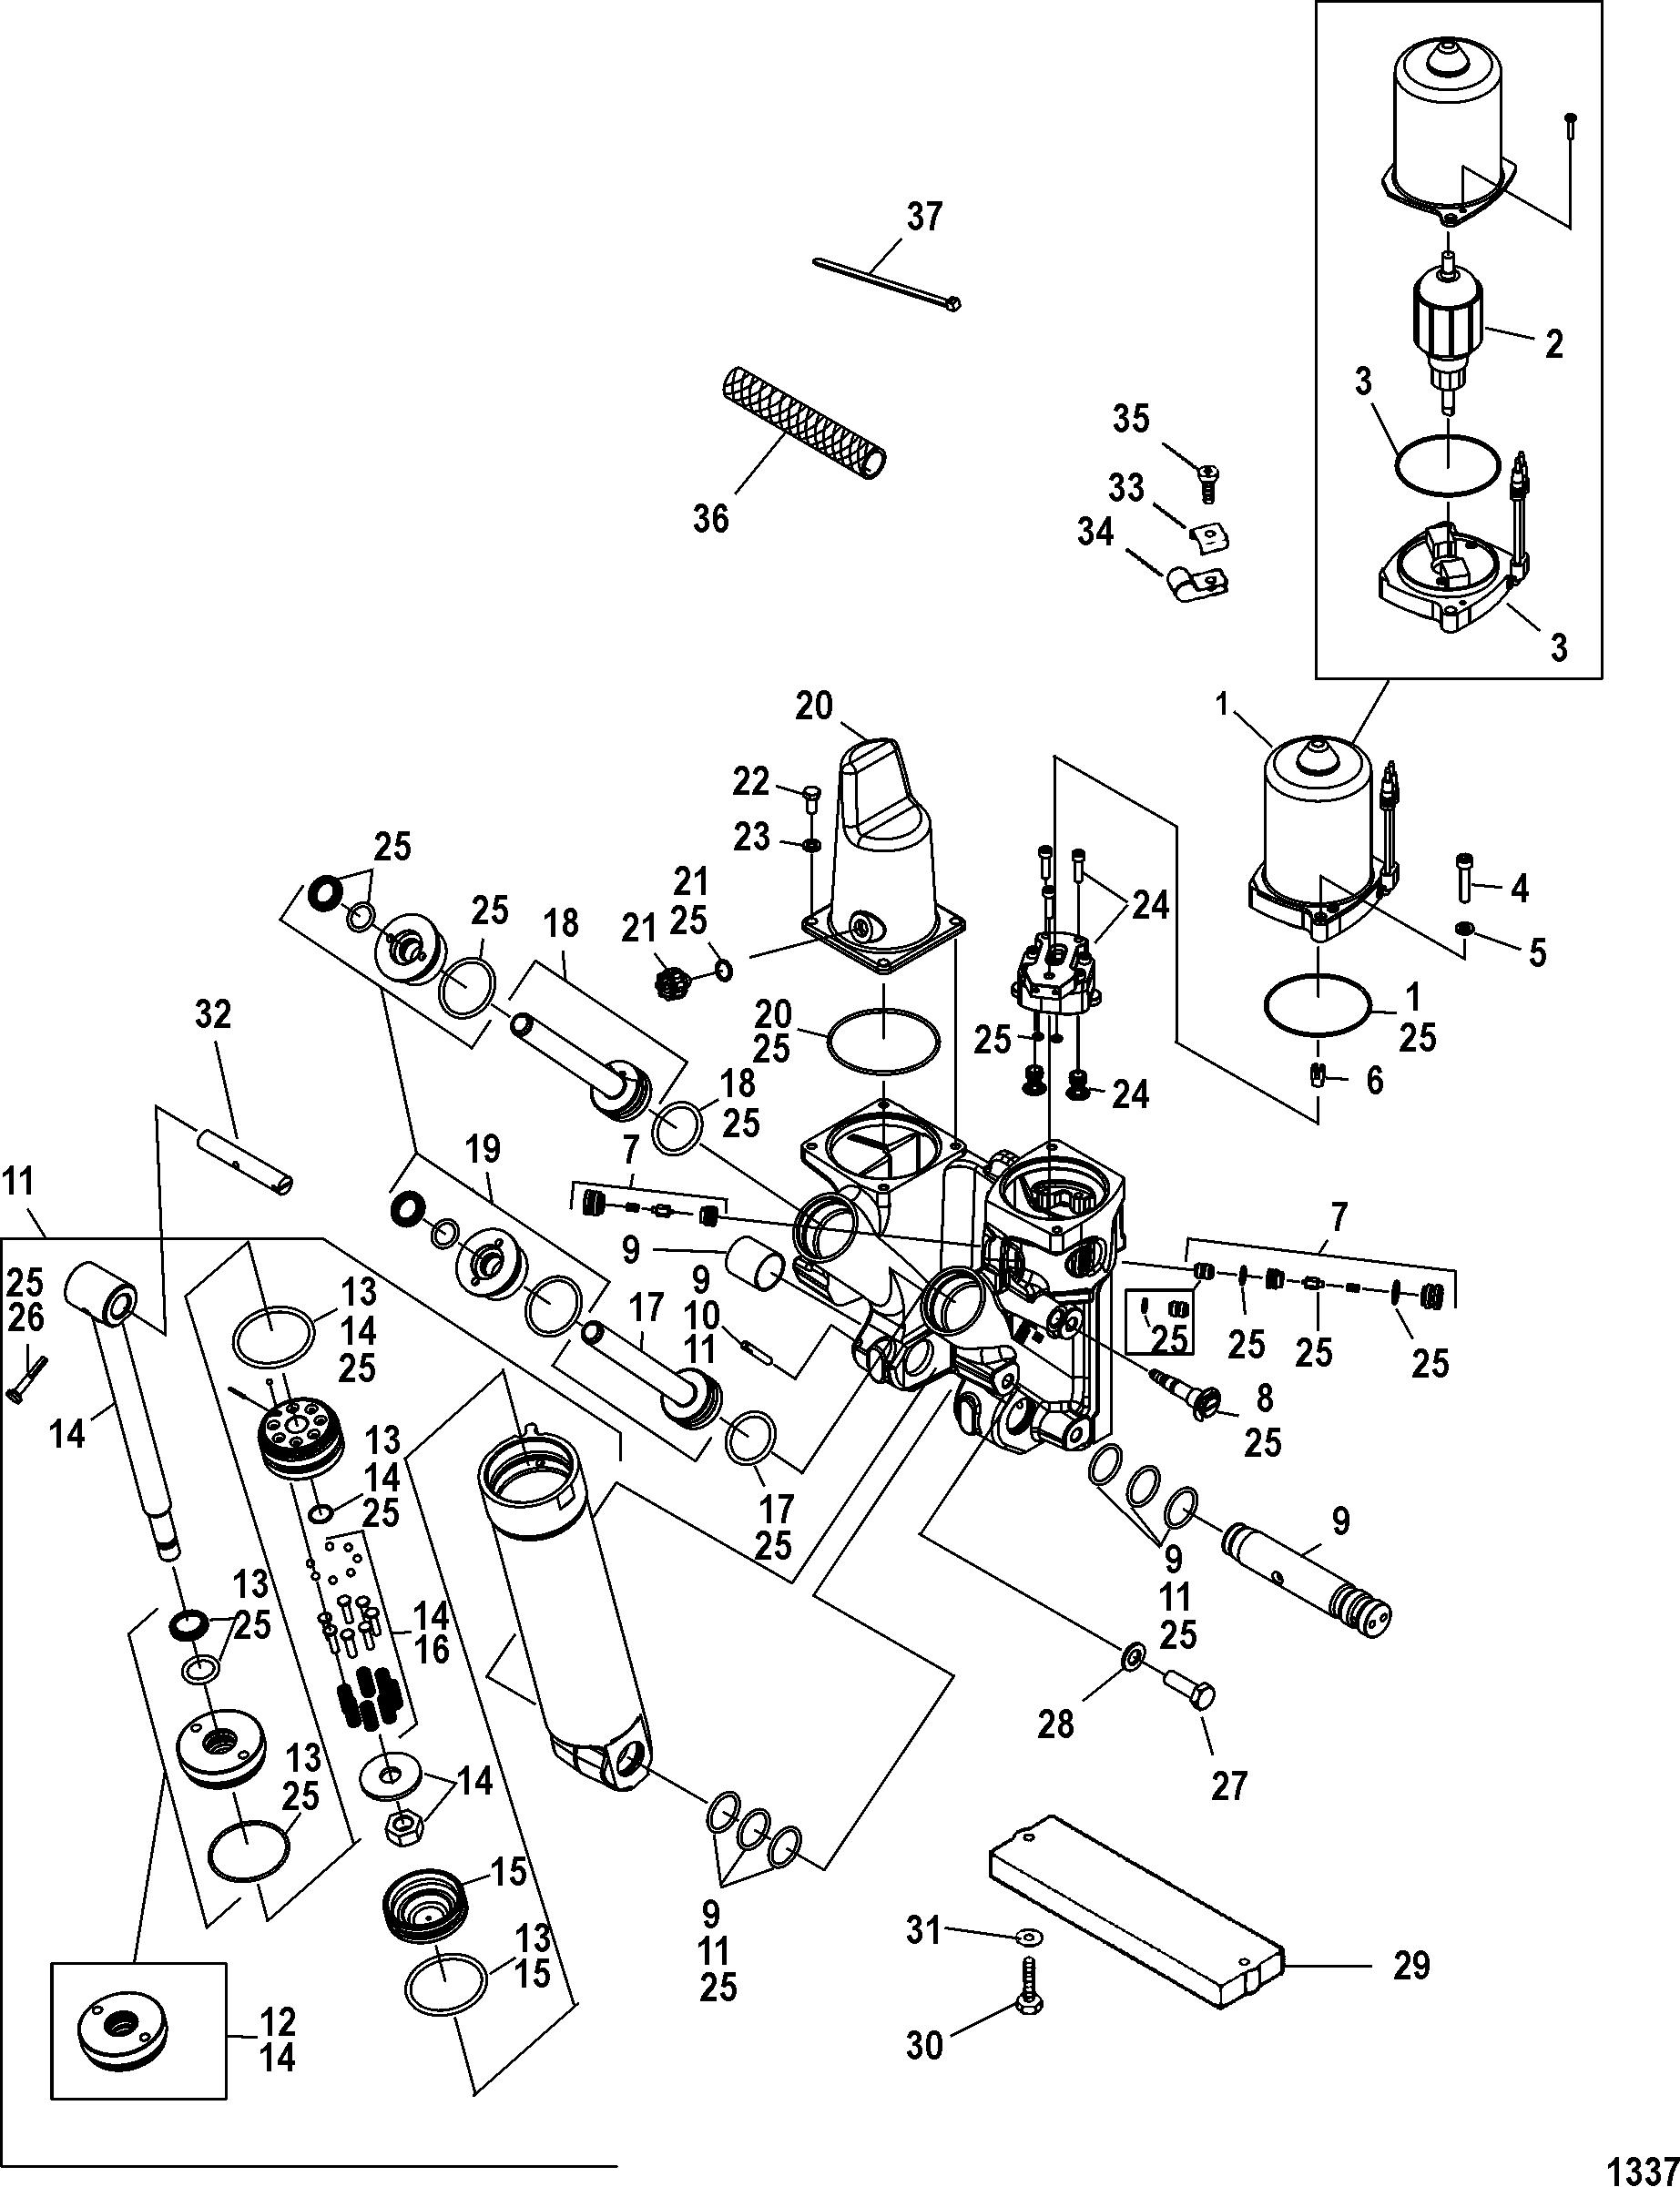 power trim components for mercury 200 optimax v6 dfi